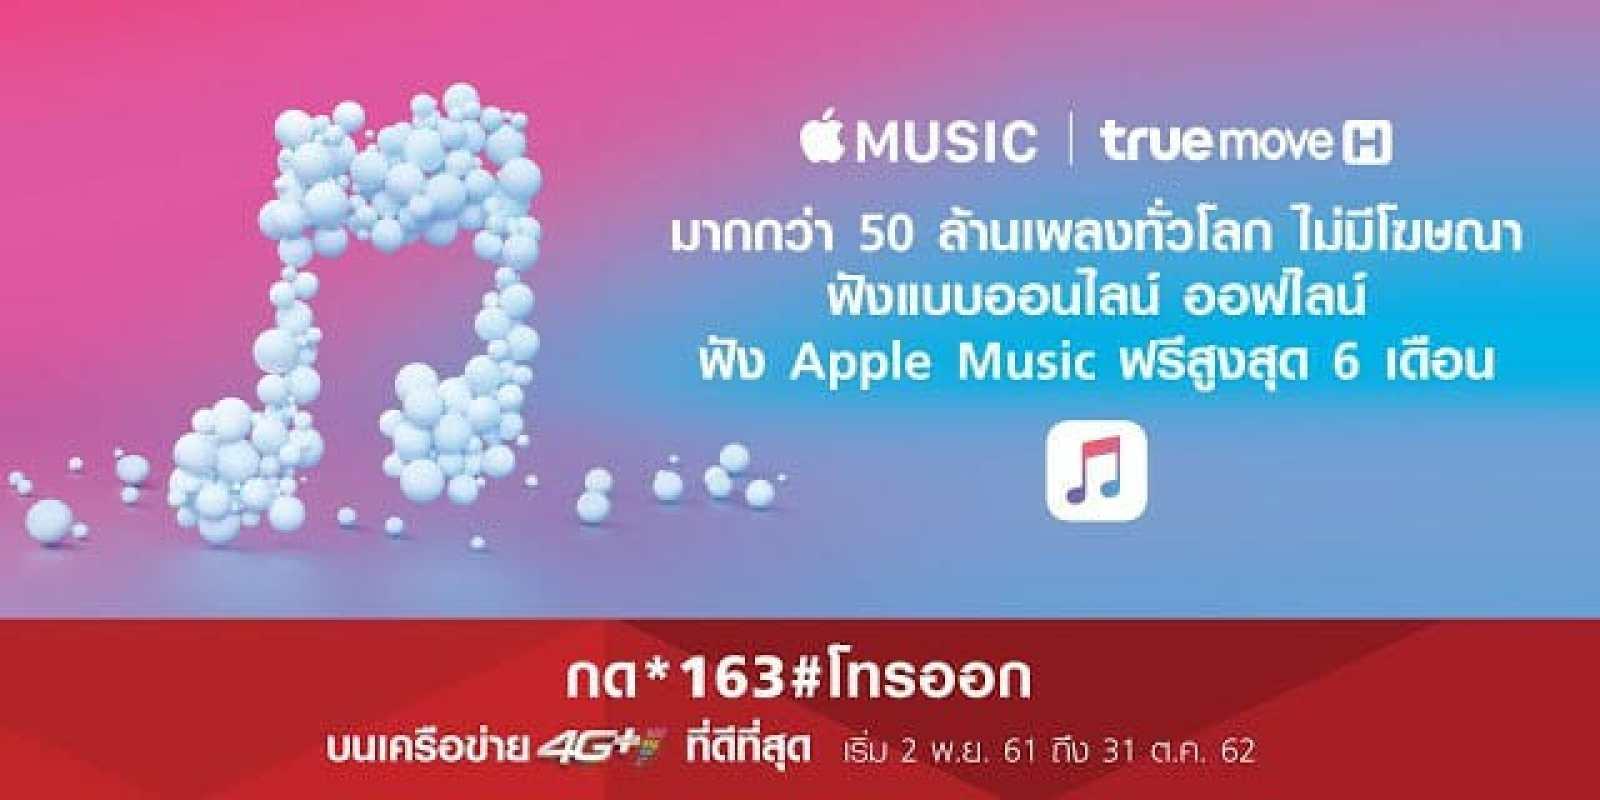 - AppleMusic online 1024x512px 2 2 - Truemove H ประกาศมอบสิทธิพิเศษให้ลูกค้าใช้บริการ Apple Music ฟรีสูงสุด 6 เดือน